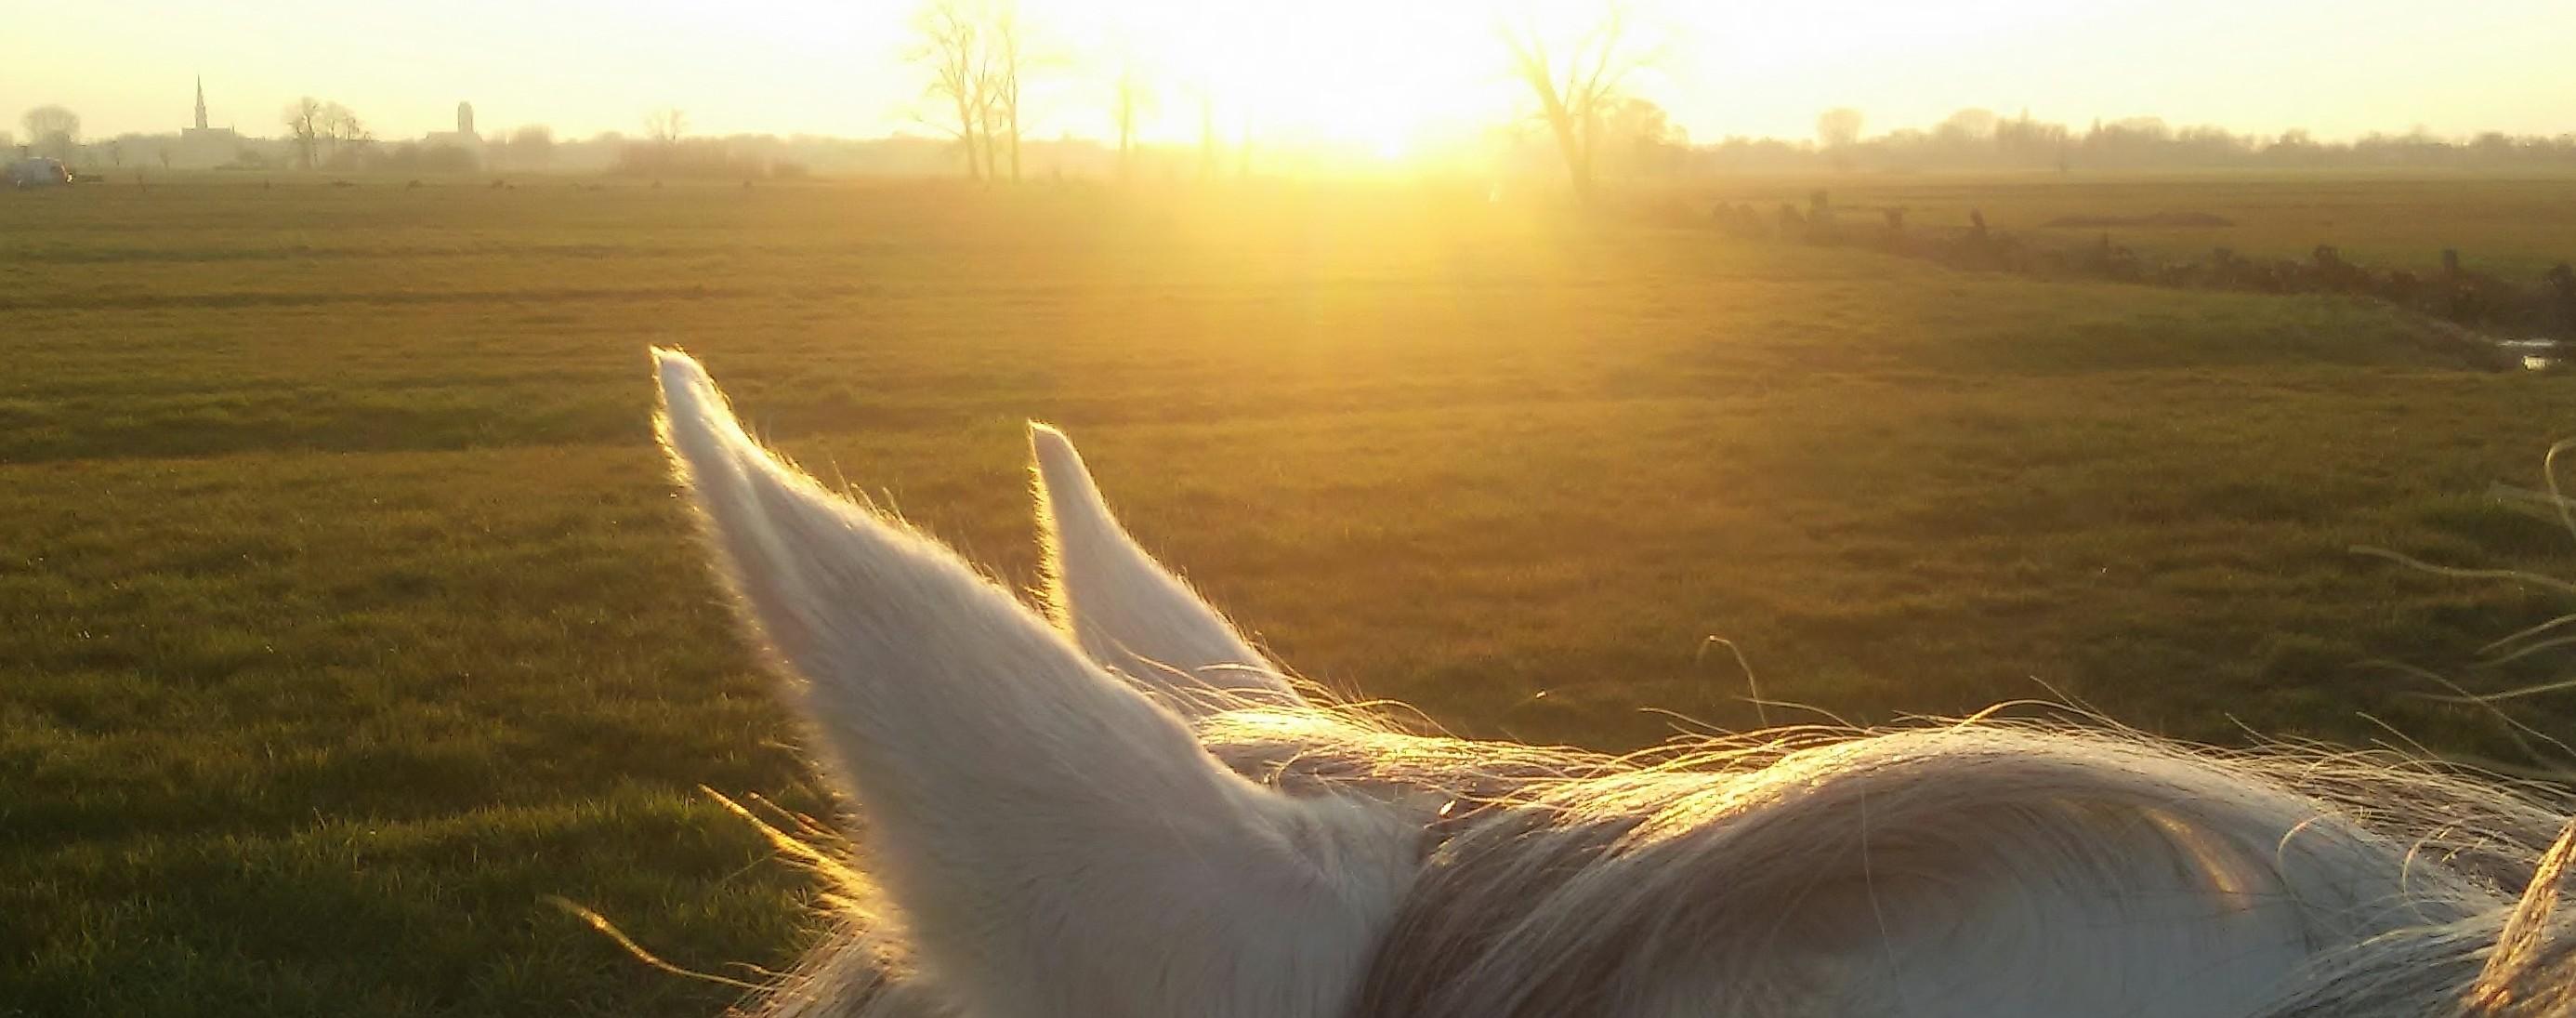 PaardEnOntwikkeling